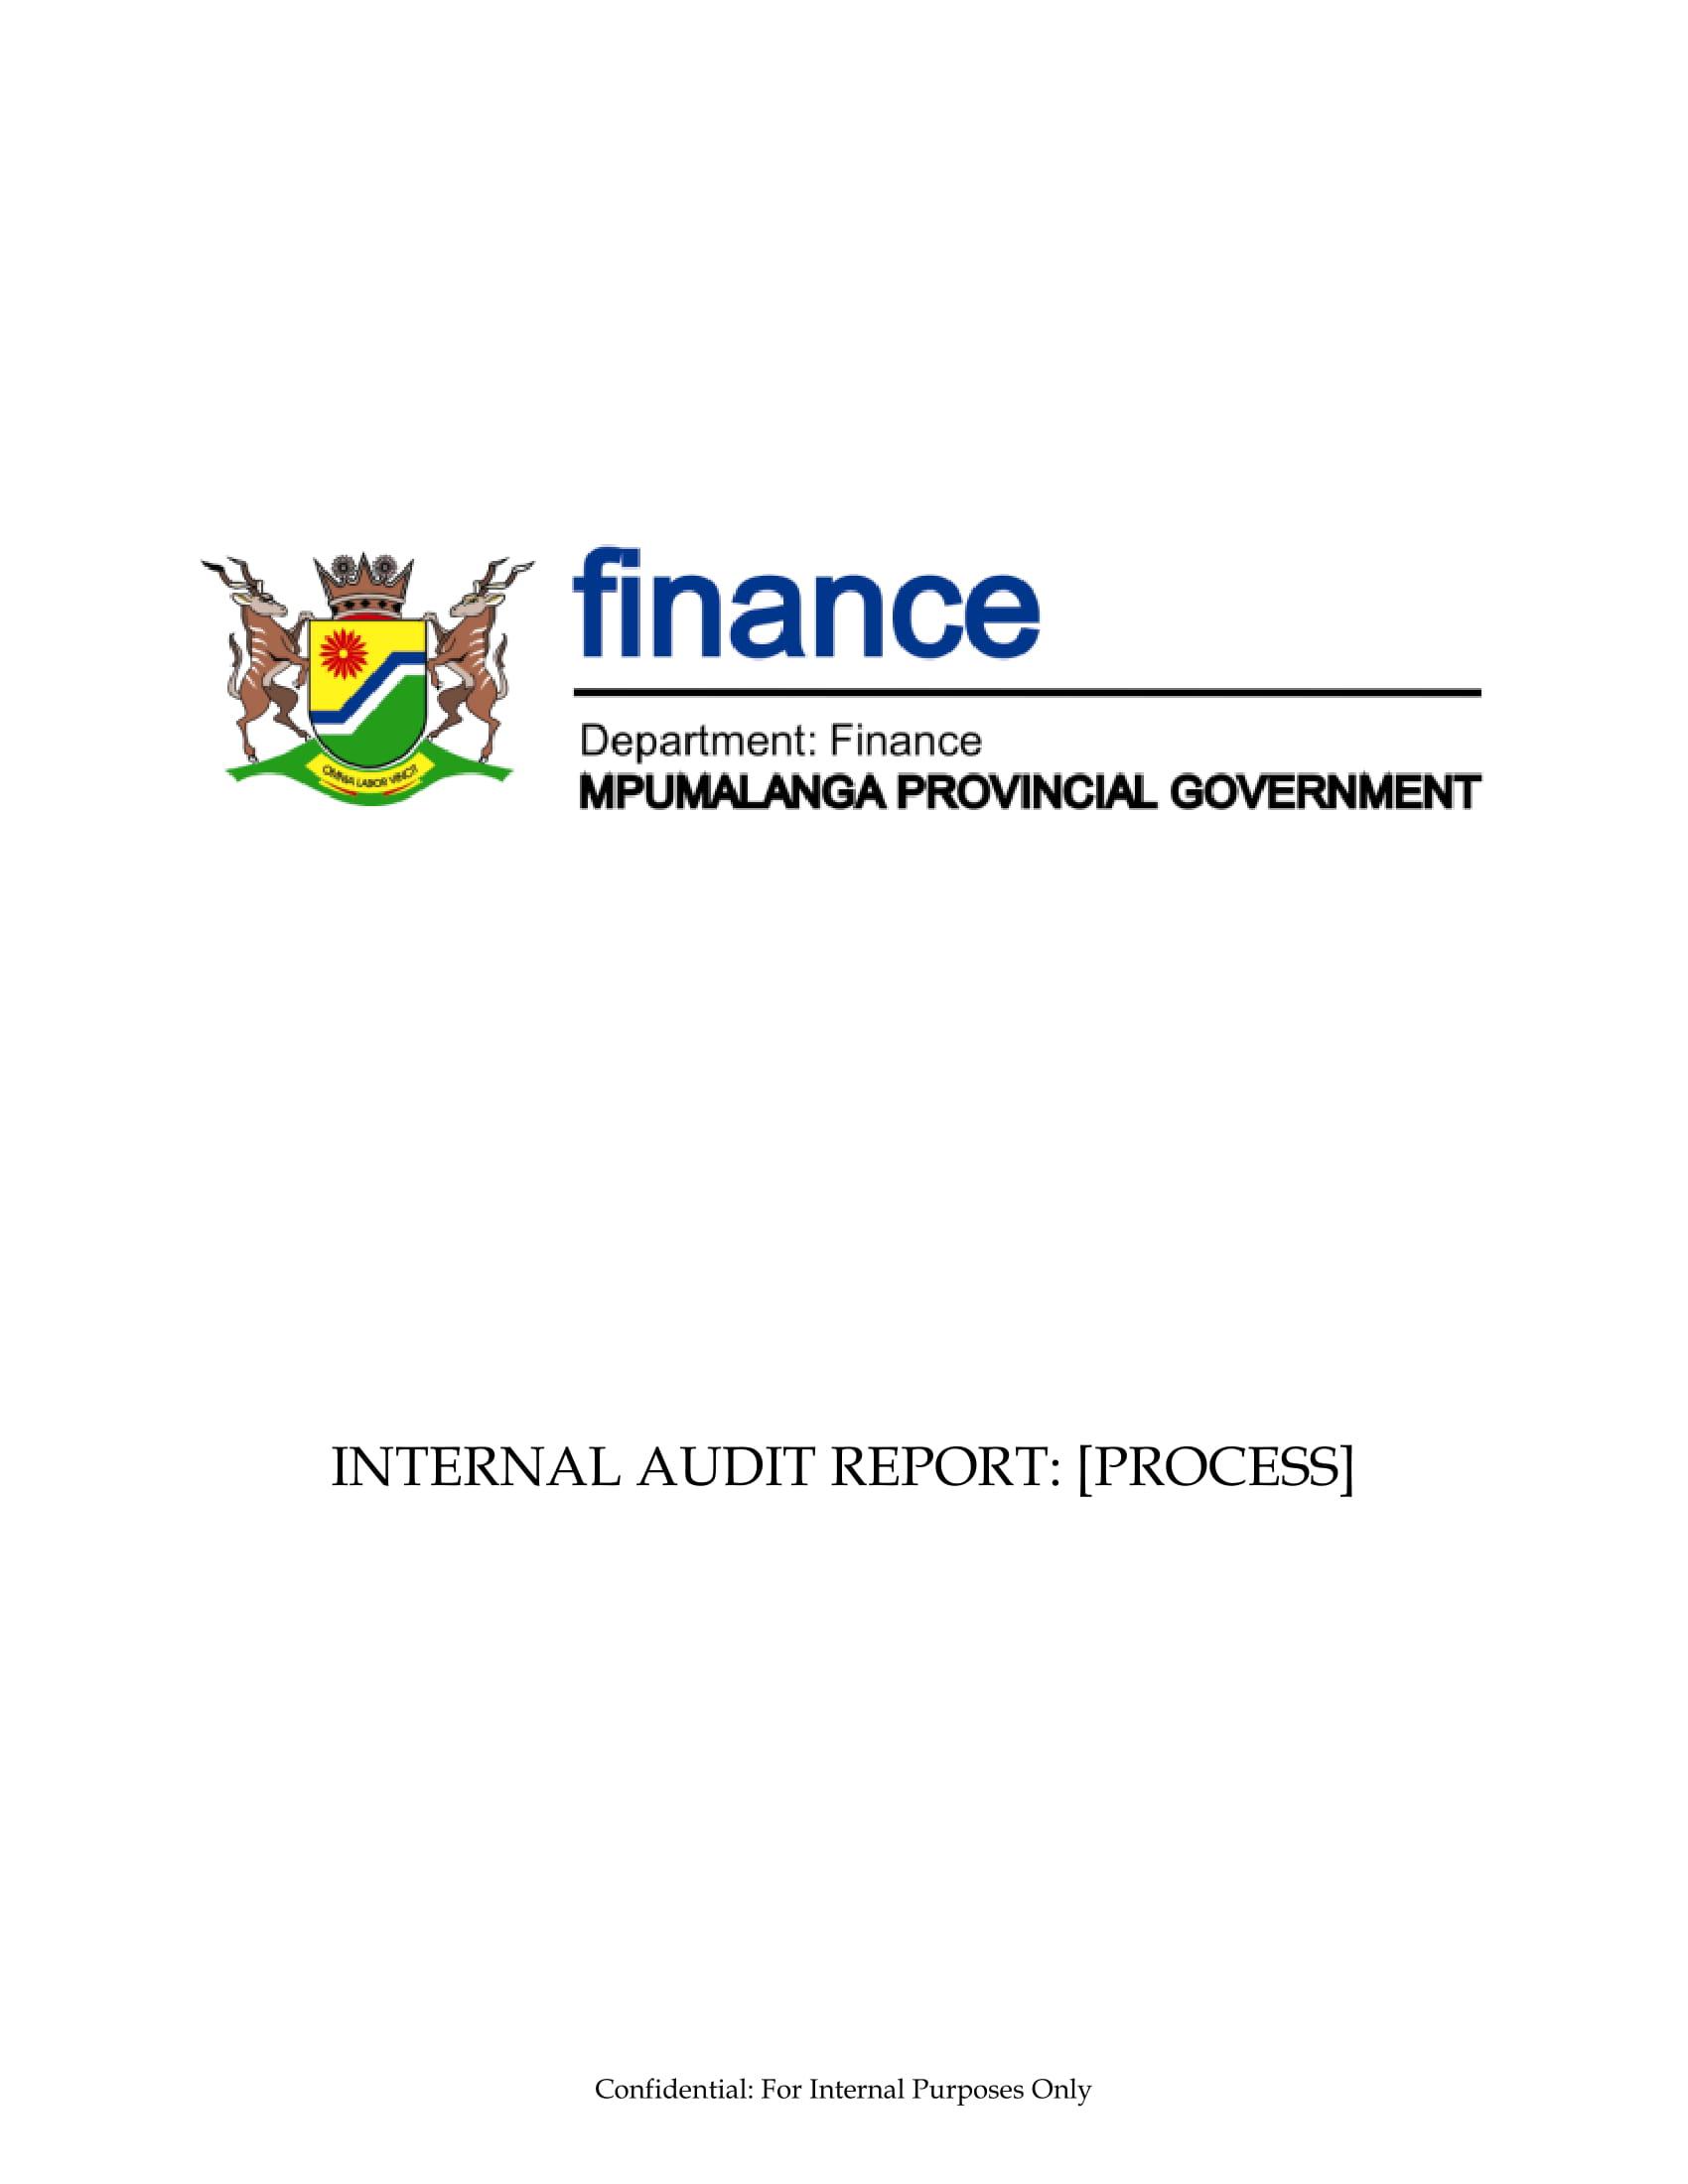 internal audit report process example 1